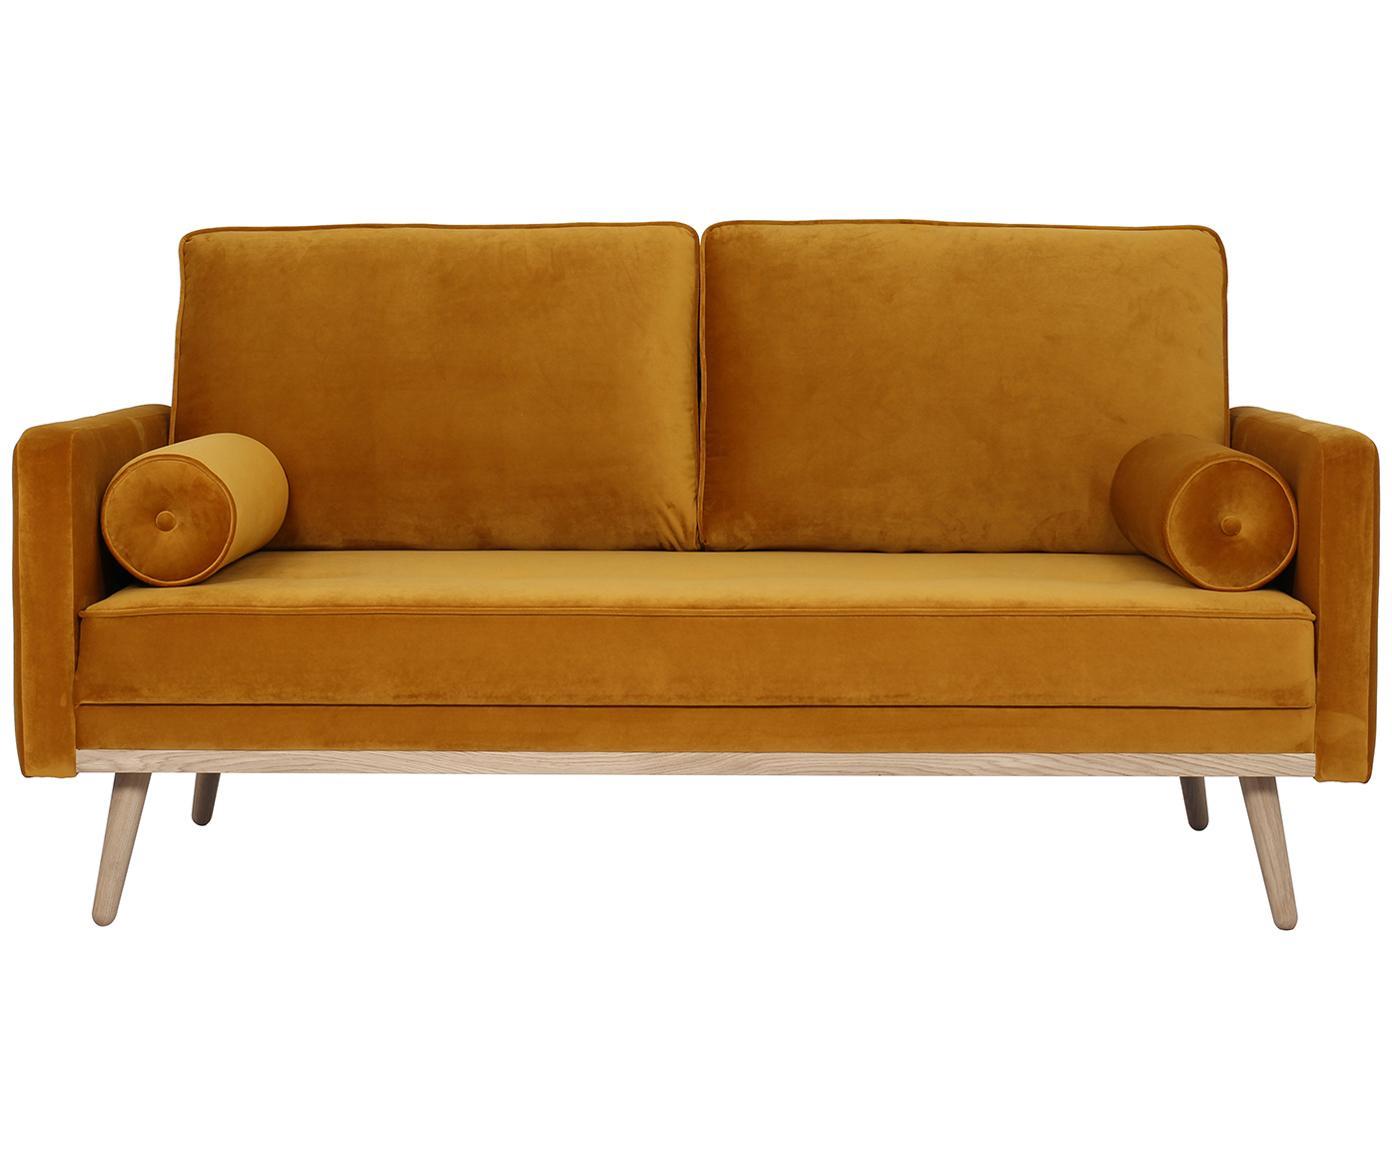 Samt-Sofa Saint (2-Sitzer), Bezug: Samt (Polyester) 35.000 S, Gestell: Massives Kiefernholz, Spa, Samt Senfgelb, B 169 x T 87 cm